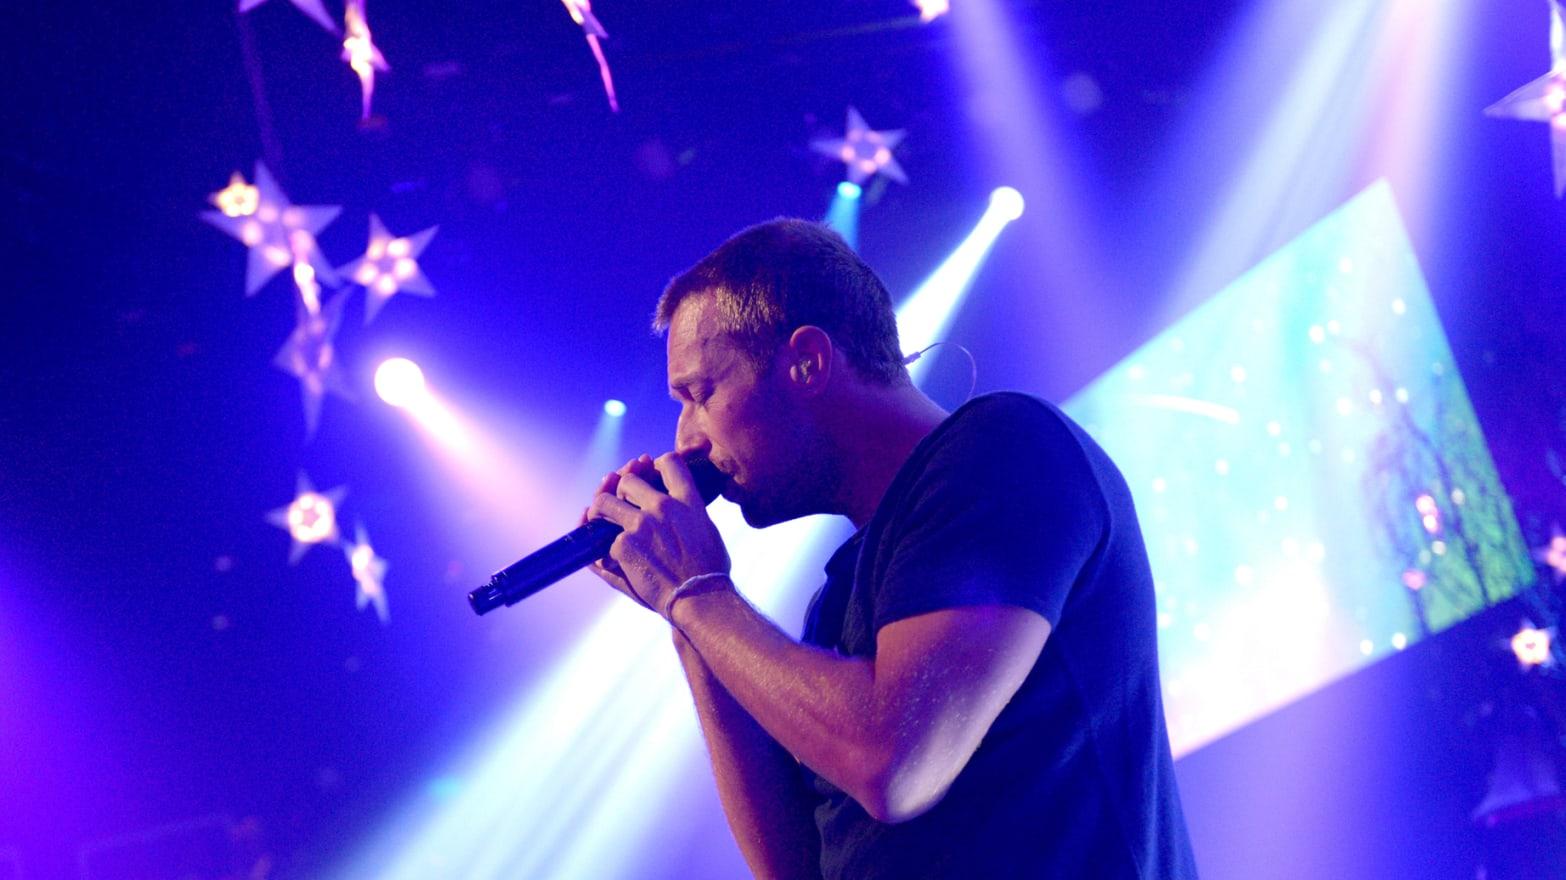 Gwyneth Paltrow Haunts Coldplay's Self-Conscious Breakup Album